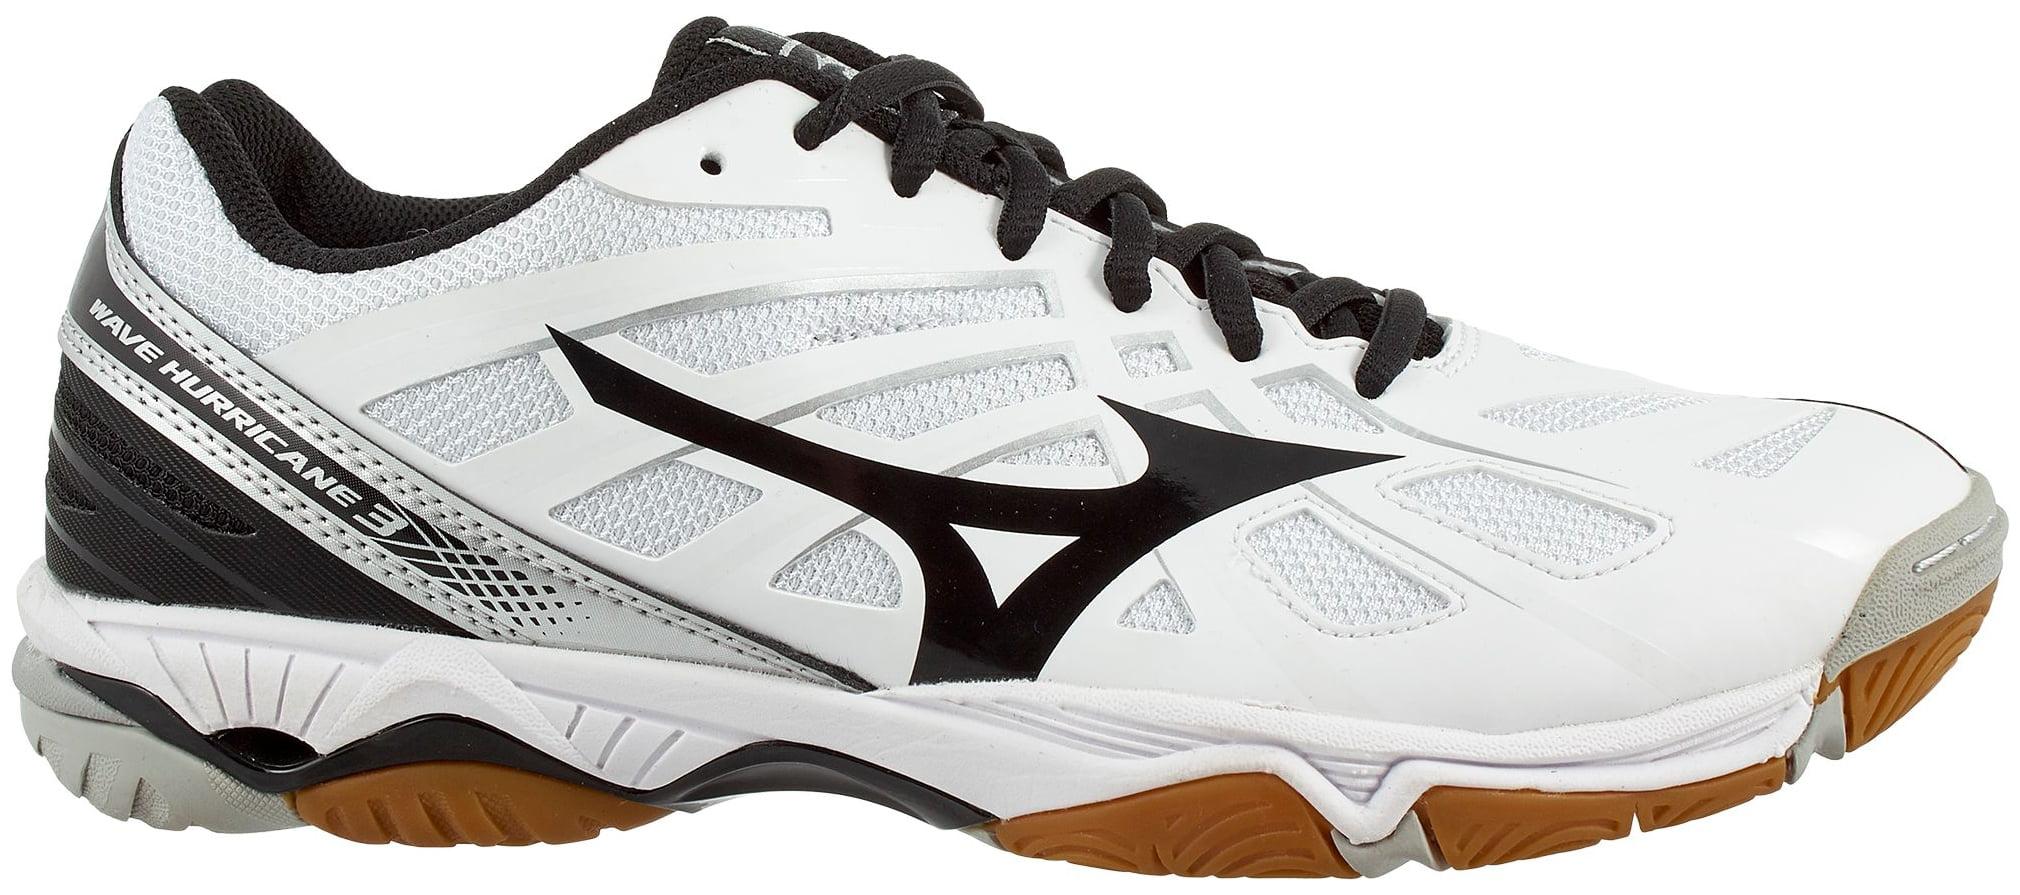 Mizuno Women's Wave Hurricane 3 Volleyball Shoes (White/Black, 6.0)